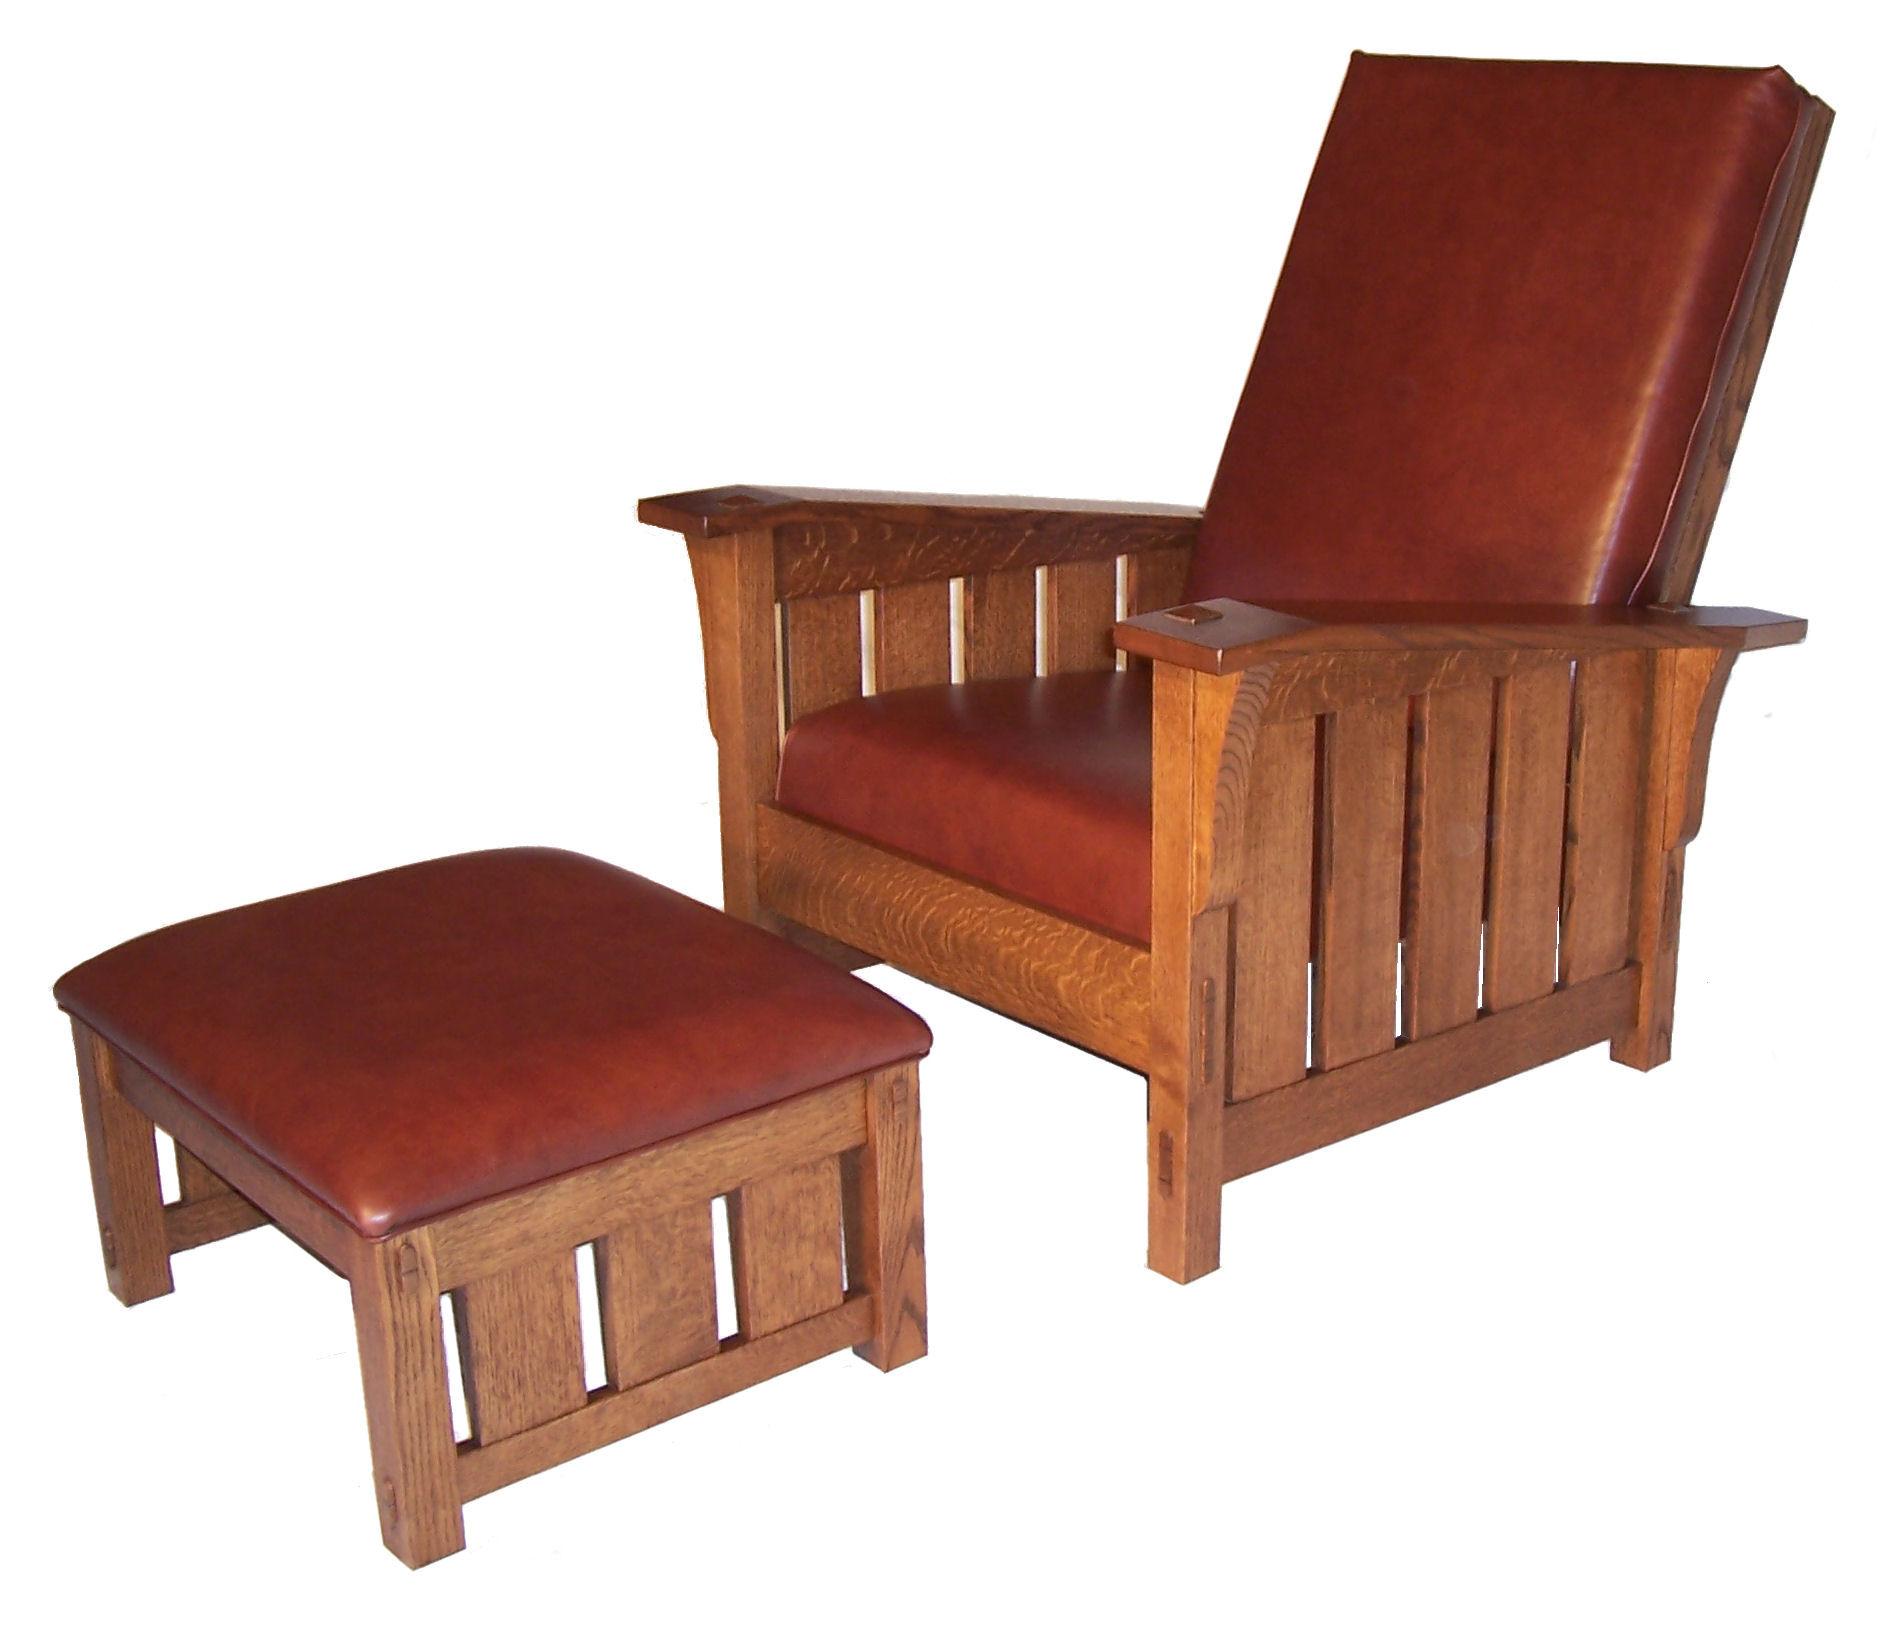 Mission Furniture Saskatoon Taylor Made Furniture